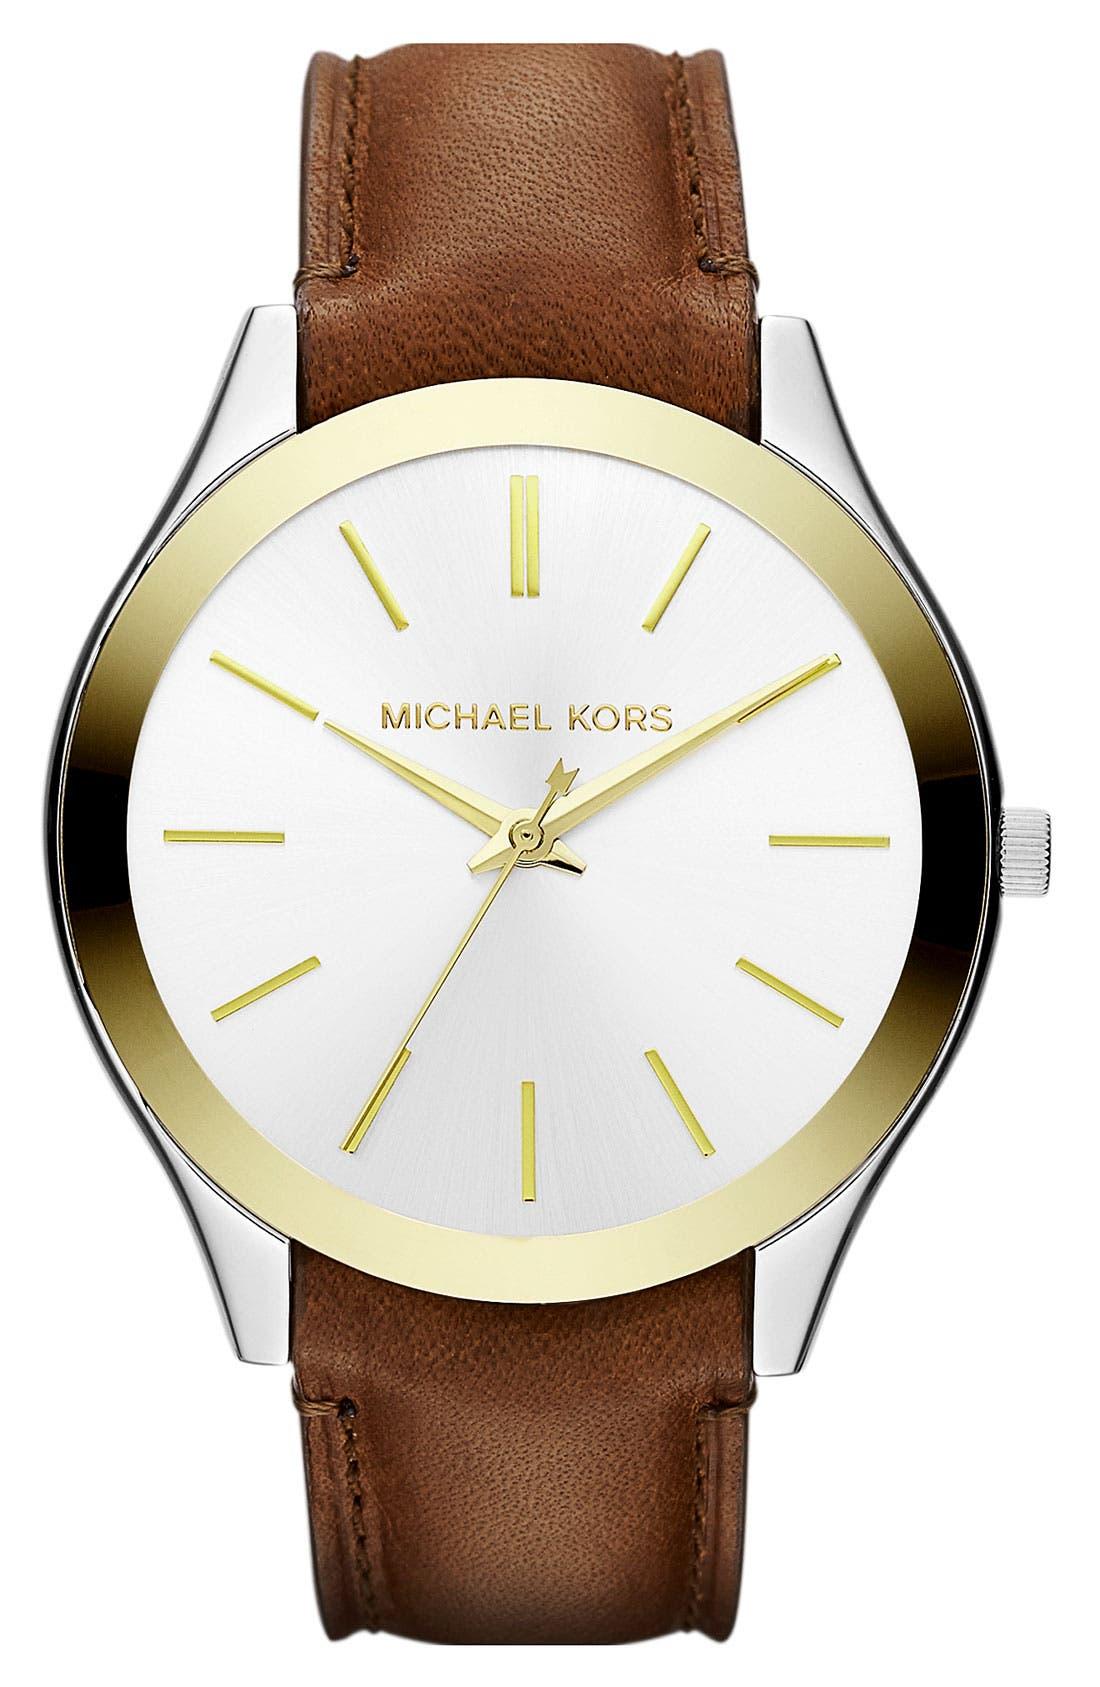 Michael Kors 'Slim Runway' Leather Strap Watch, 42mm,                         Main,                         color, 200